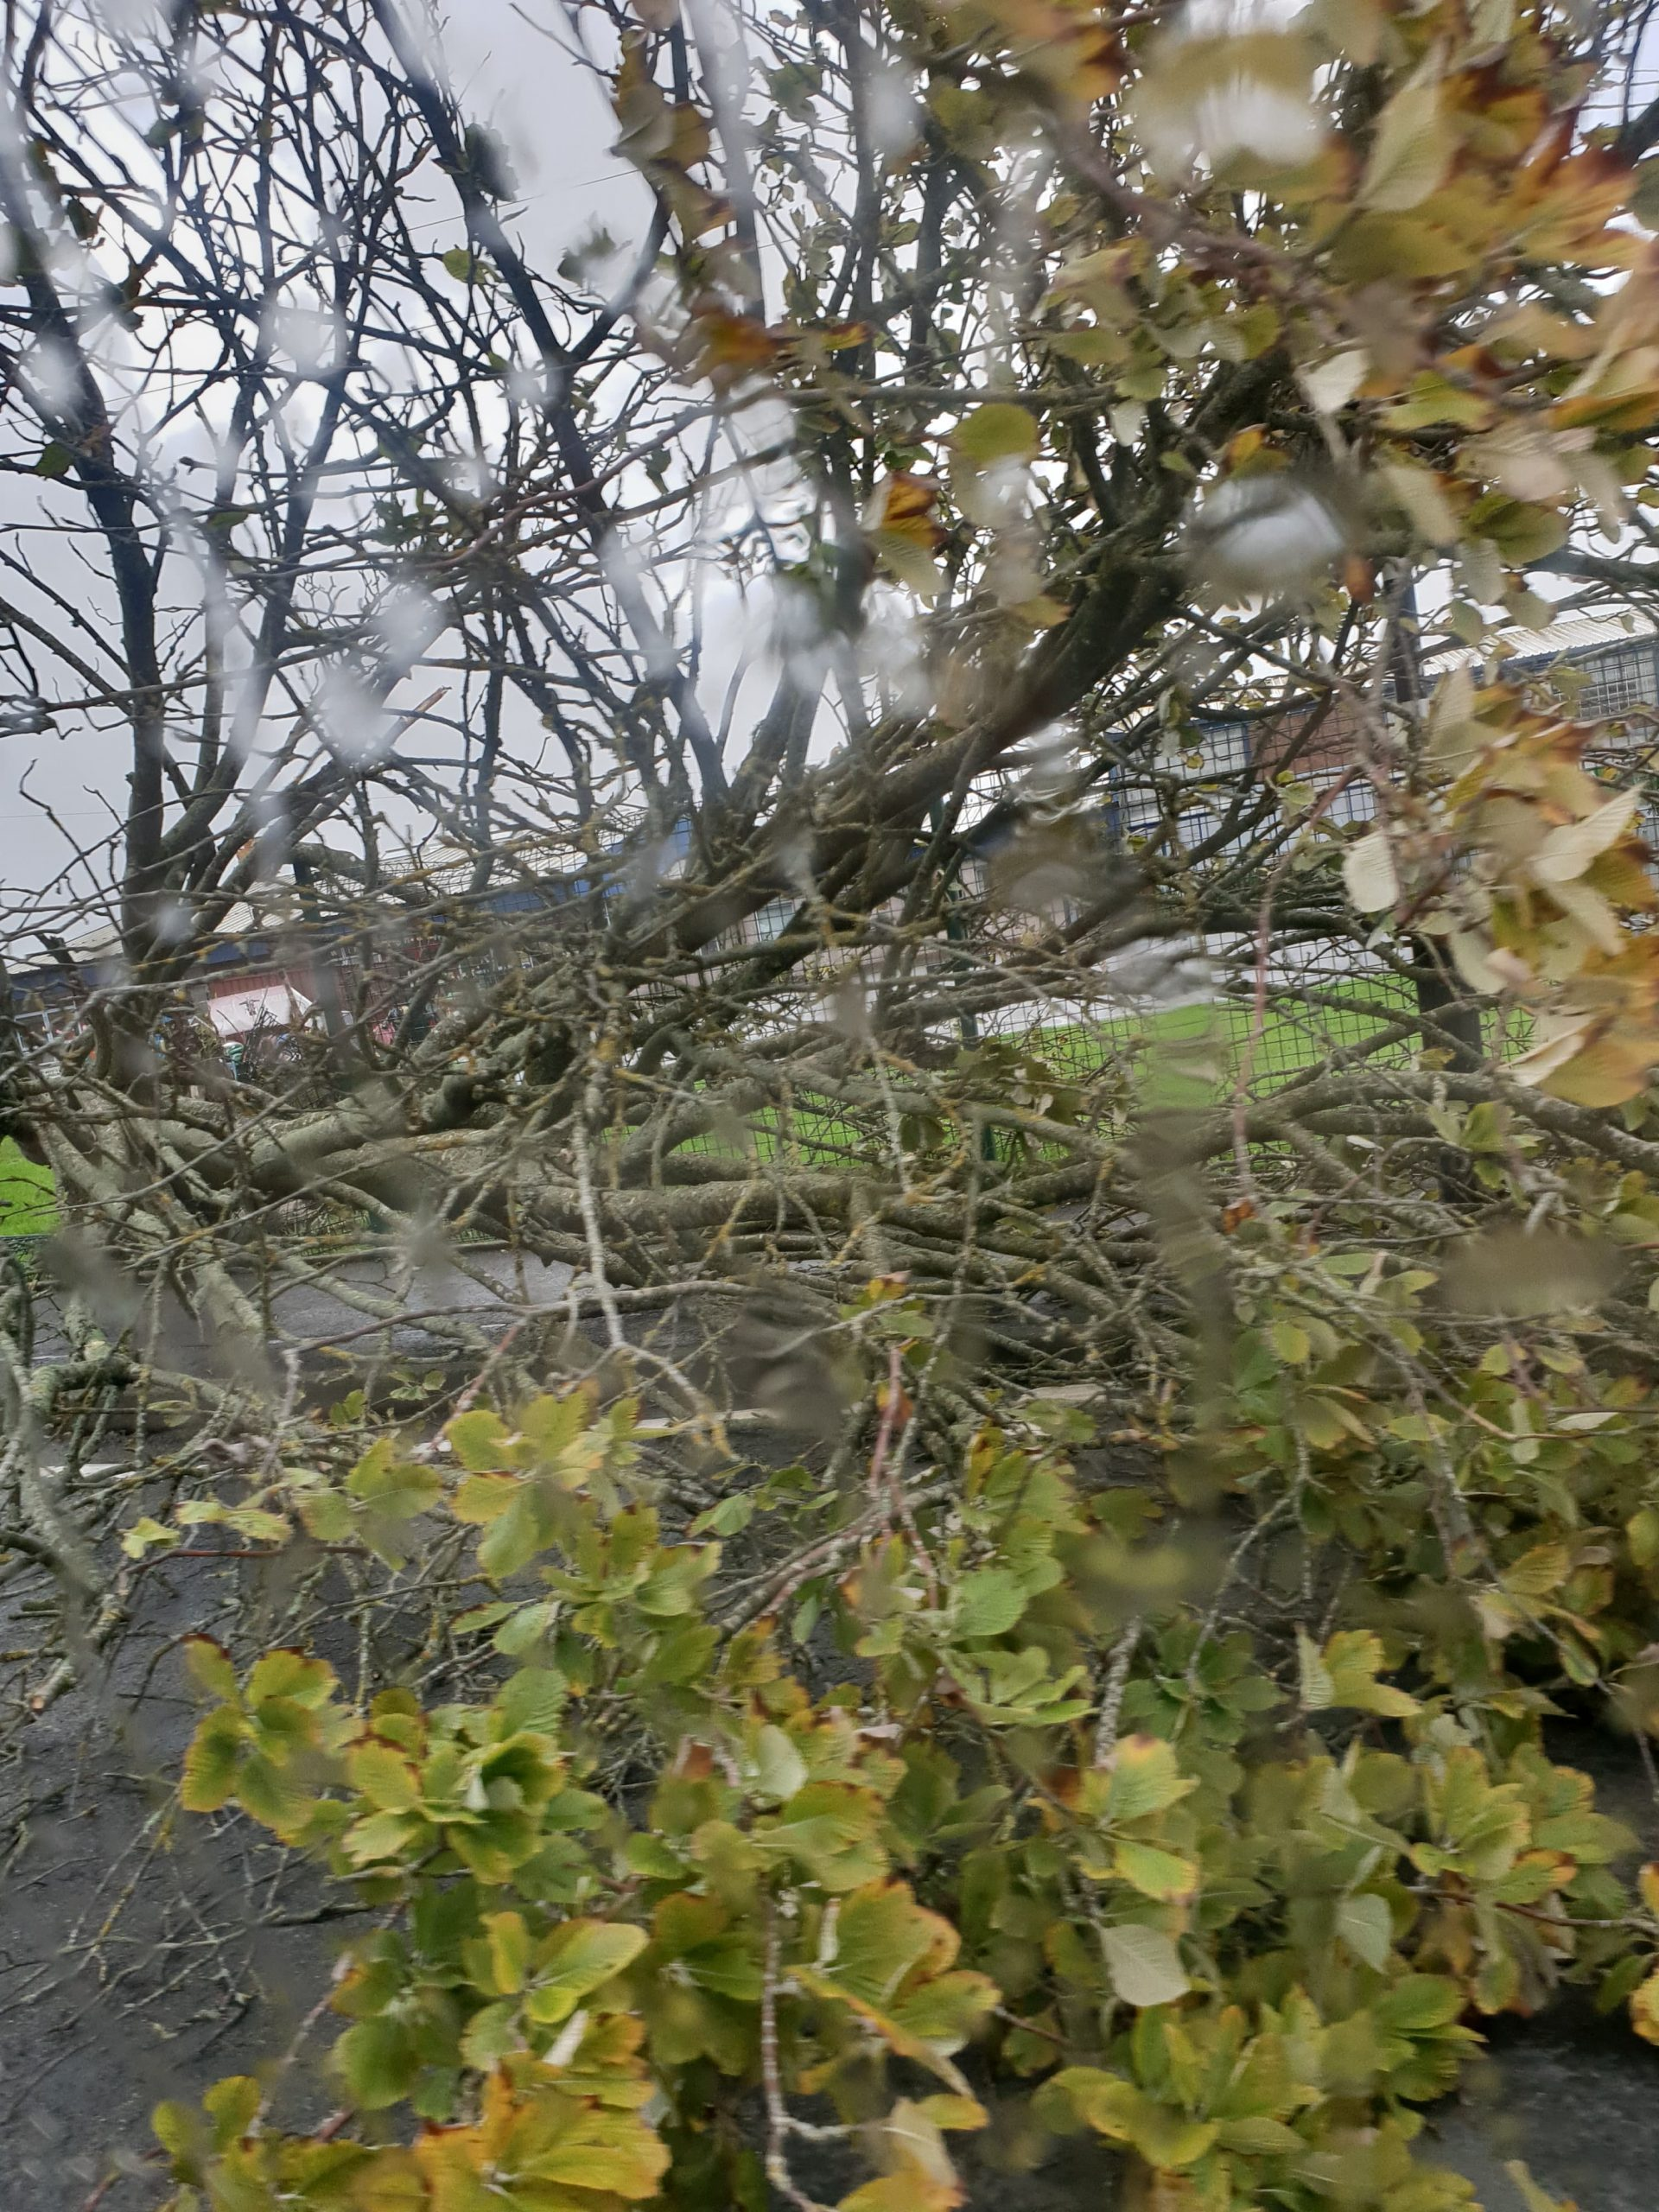 Tree felling concerns addressed